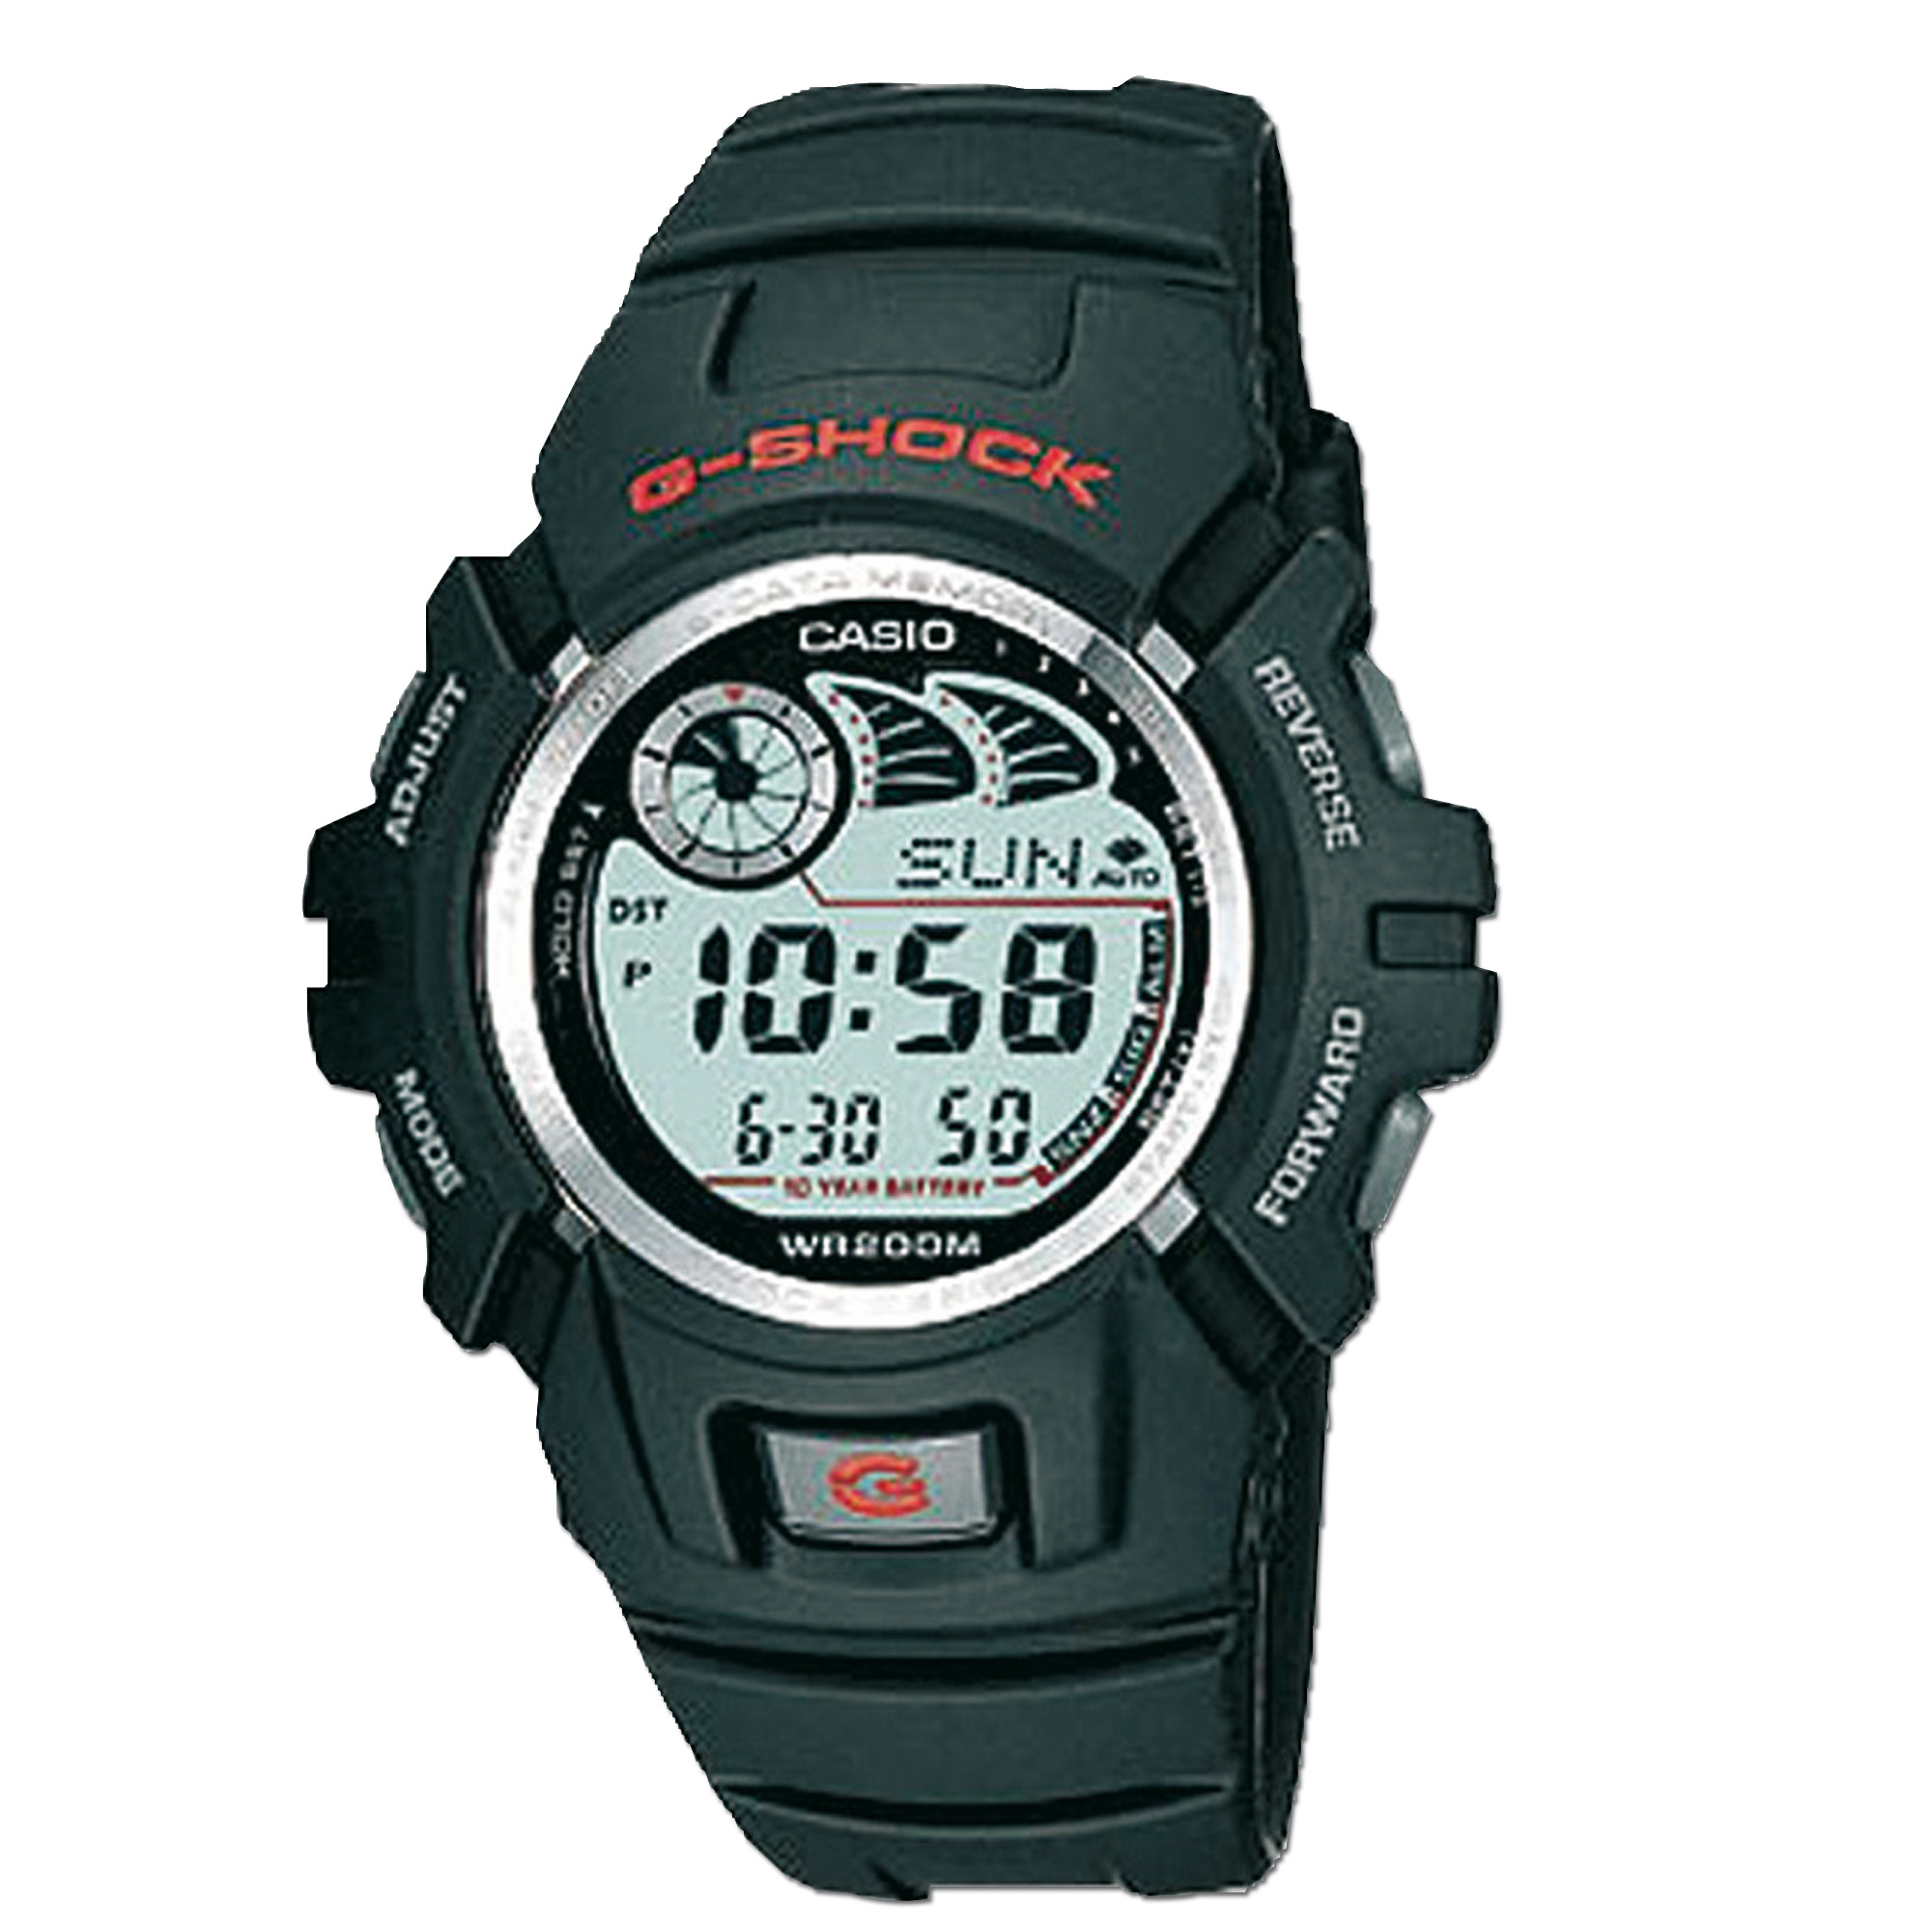 Wristwatch Casio G-Shock Life Force